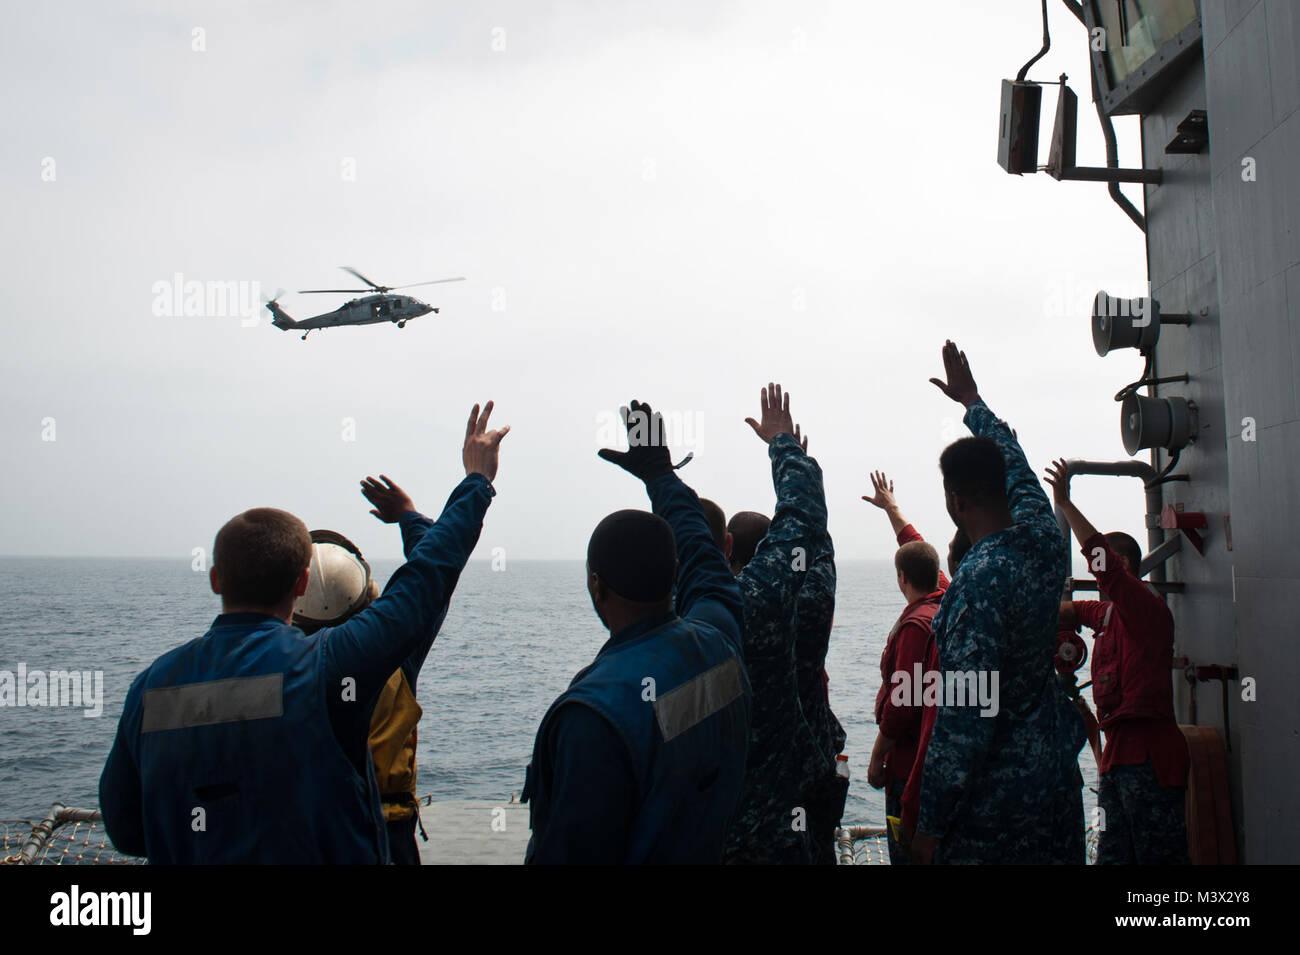 Charmant Militäroffizier Fährt Fort Fotos - Entry Level Resume ...